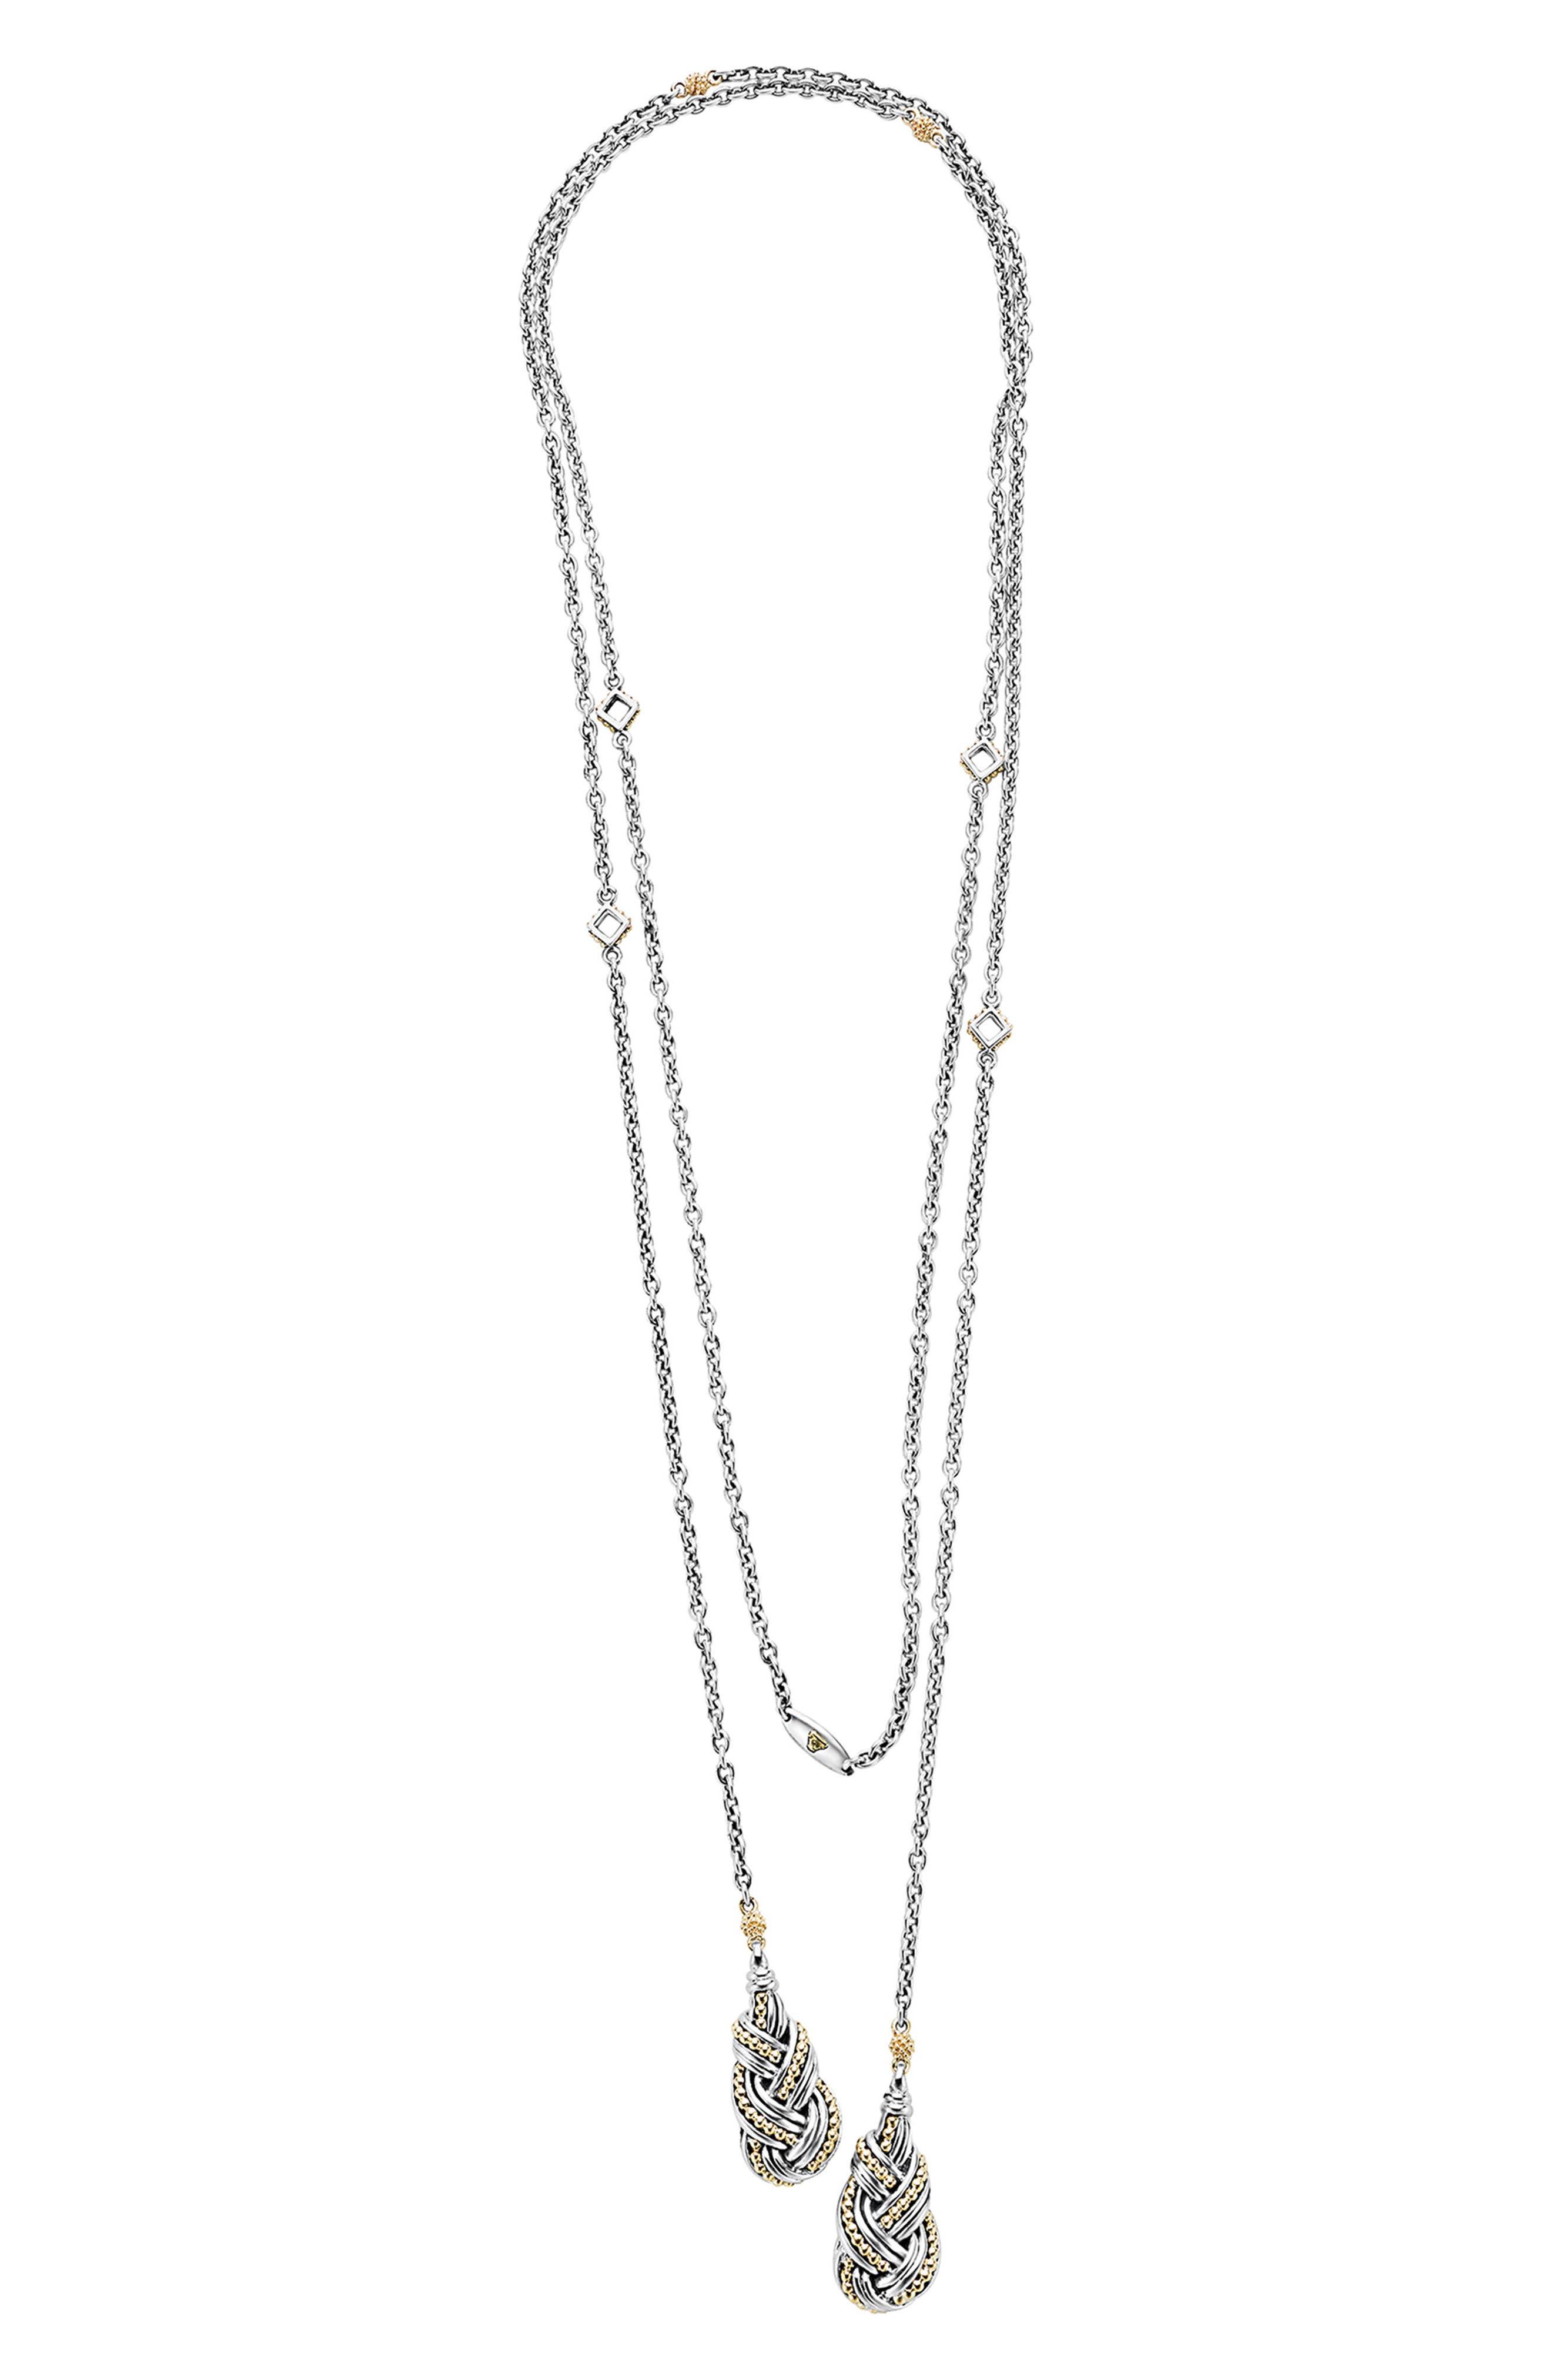 Torsade Lariat Necklace,                             Main thumbnail 1, color,                             Silver/ Gold